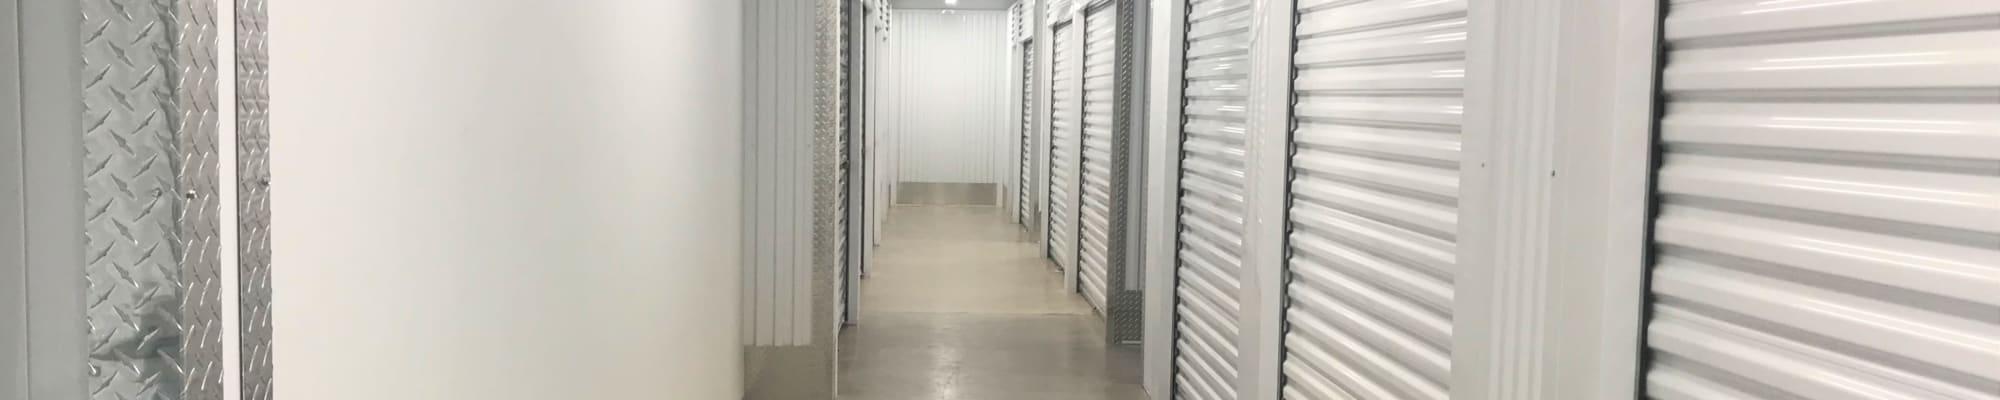 Unit sizes & prices at Storage 365 in Golden Valley, Minnesota